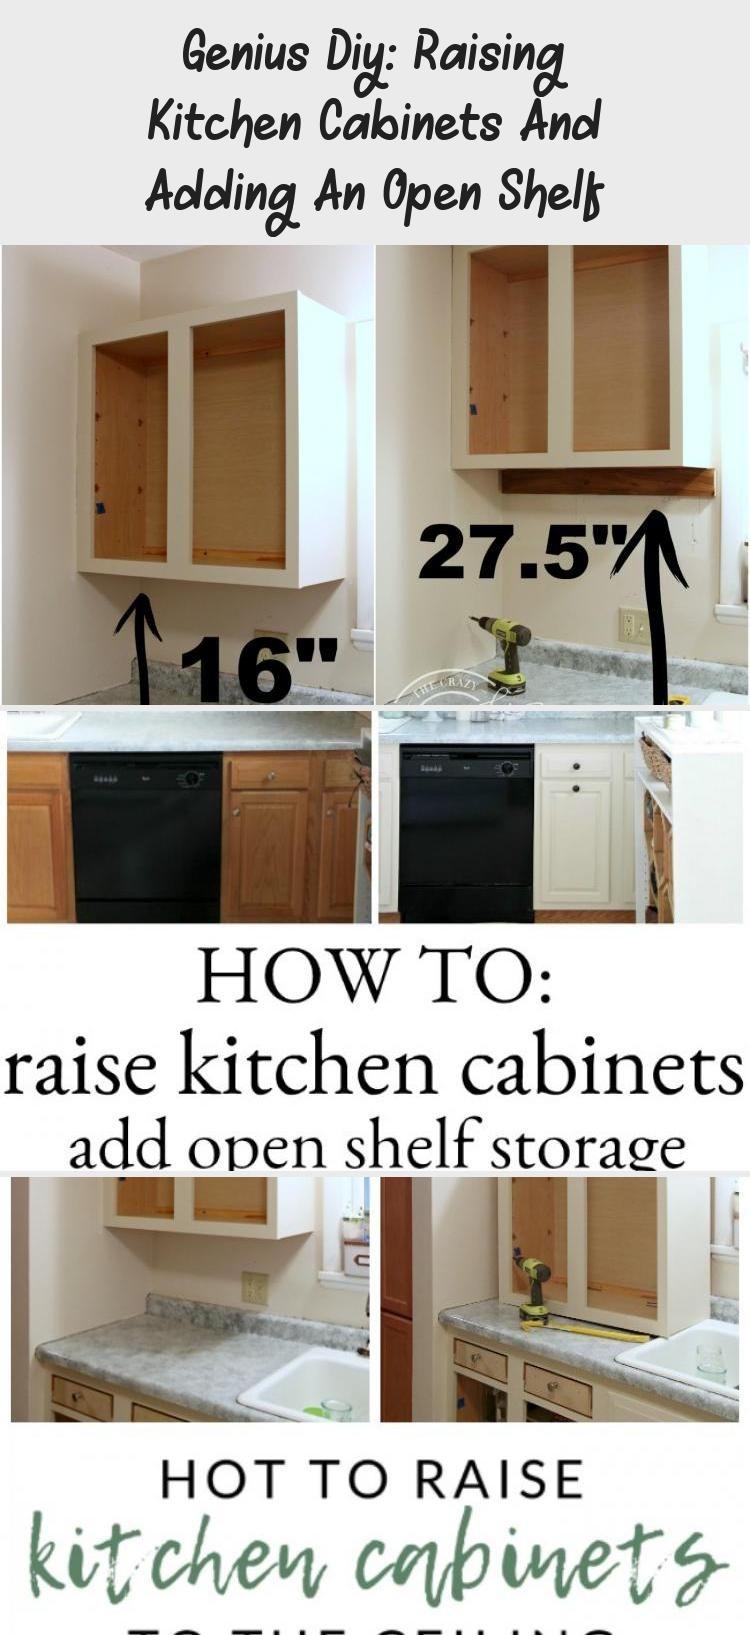 Genius Diy Raising Kitchen Cabinets And Adding An Open Shelf Kitchen Cabinets Cheap Kitchen Cabinets Diy Kitchen Decor